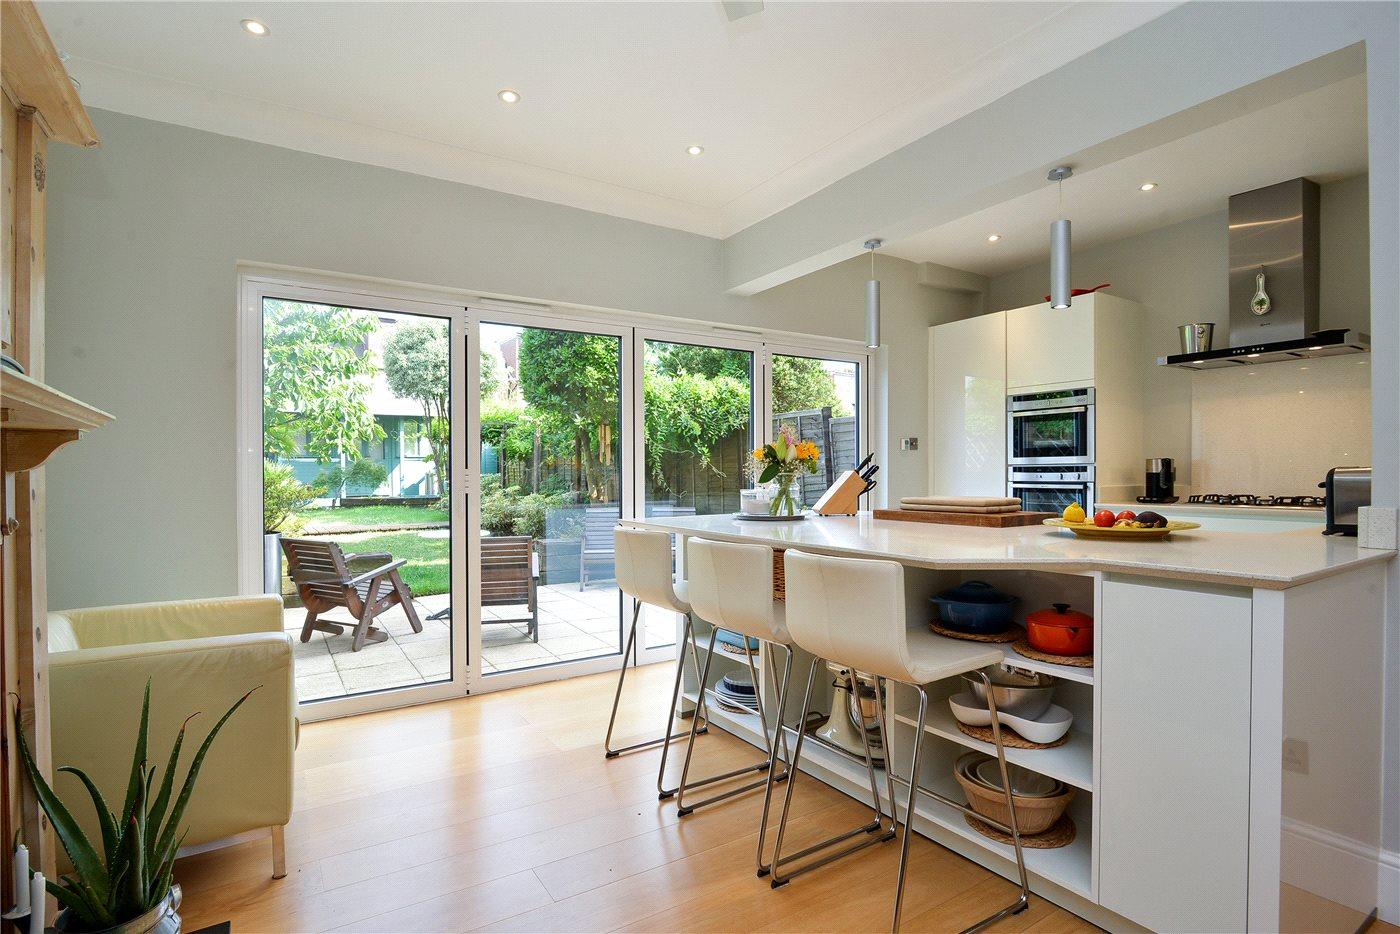 Is 747 A Good Credit Score >> 4 bedroom semi-detached house for sale, Mundania Road, East Dulwich, London SE, SE22 0NW